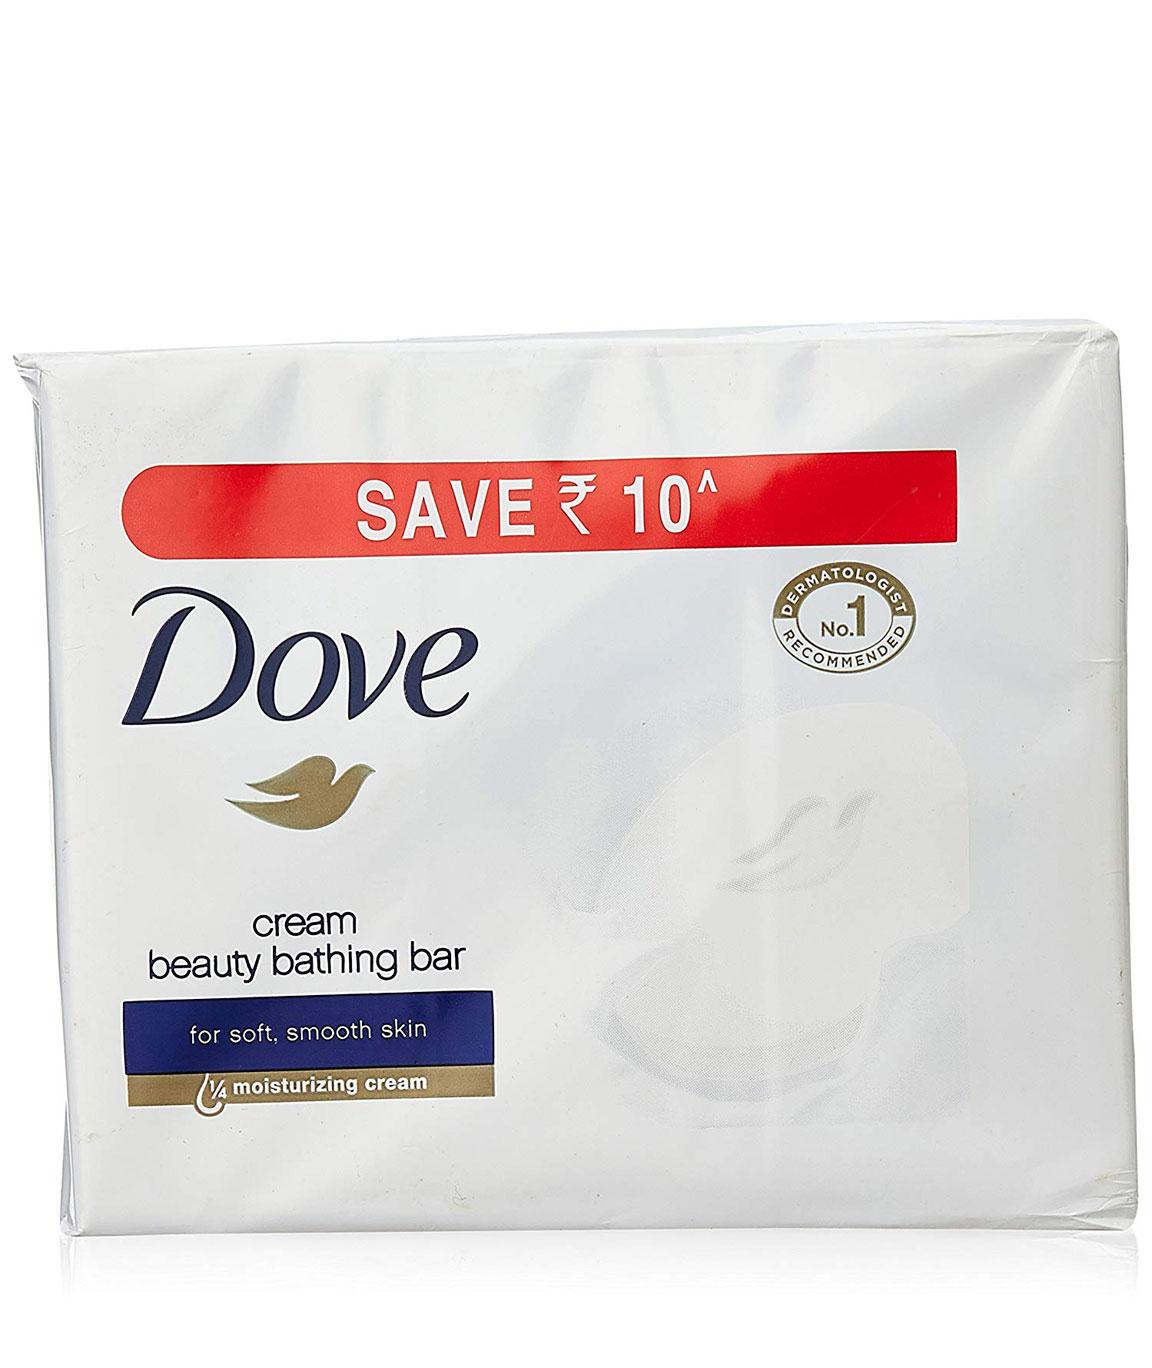 Dove Cream Beauty Bathing Bar 3 X 100g